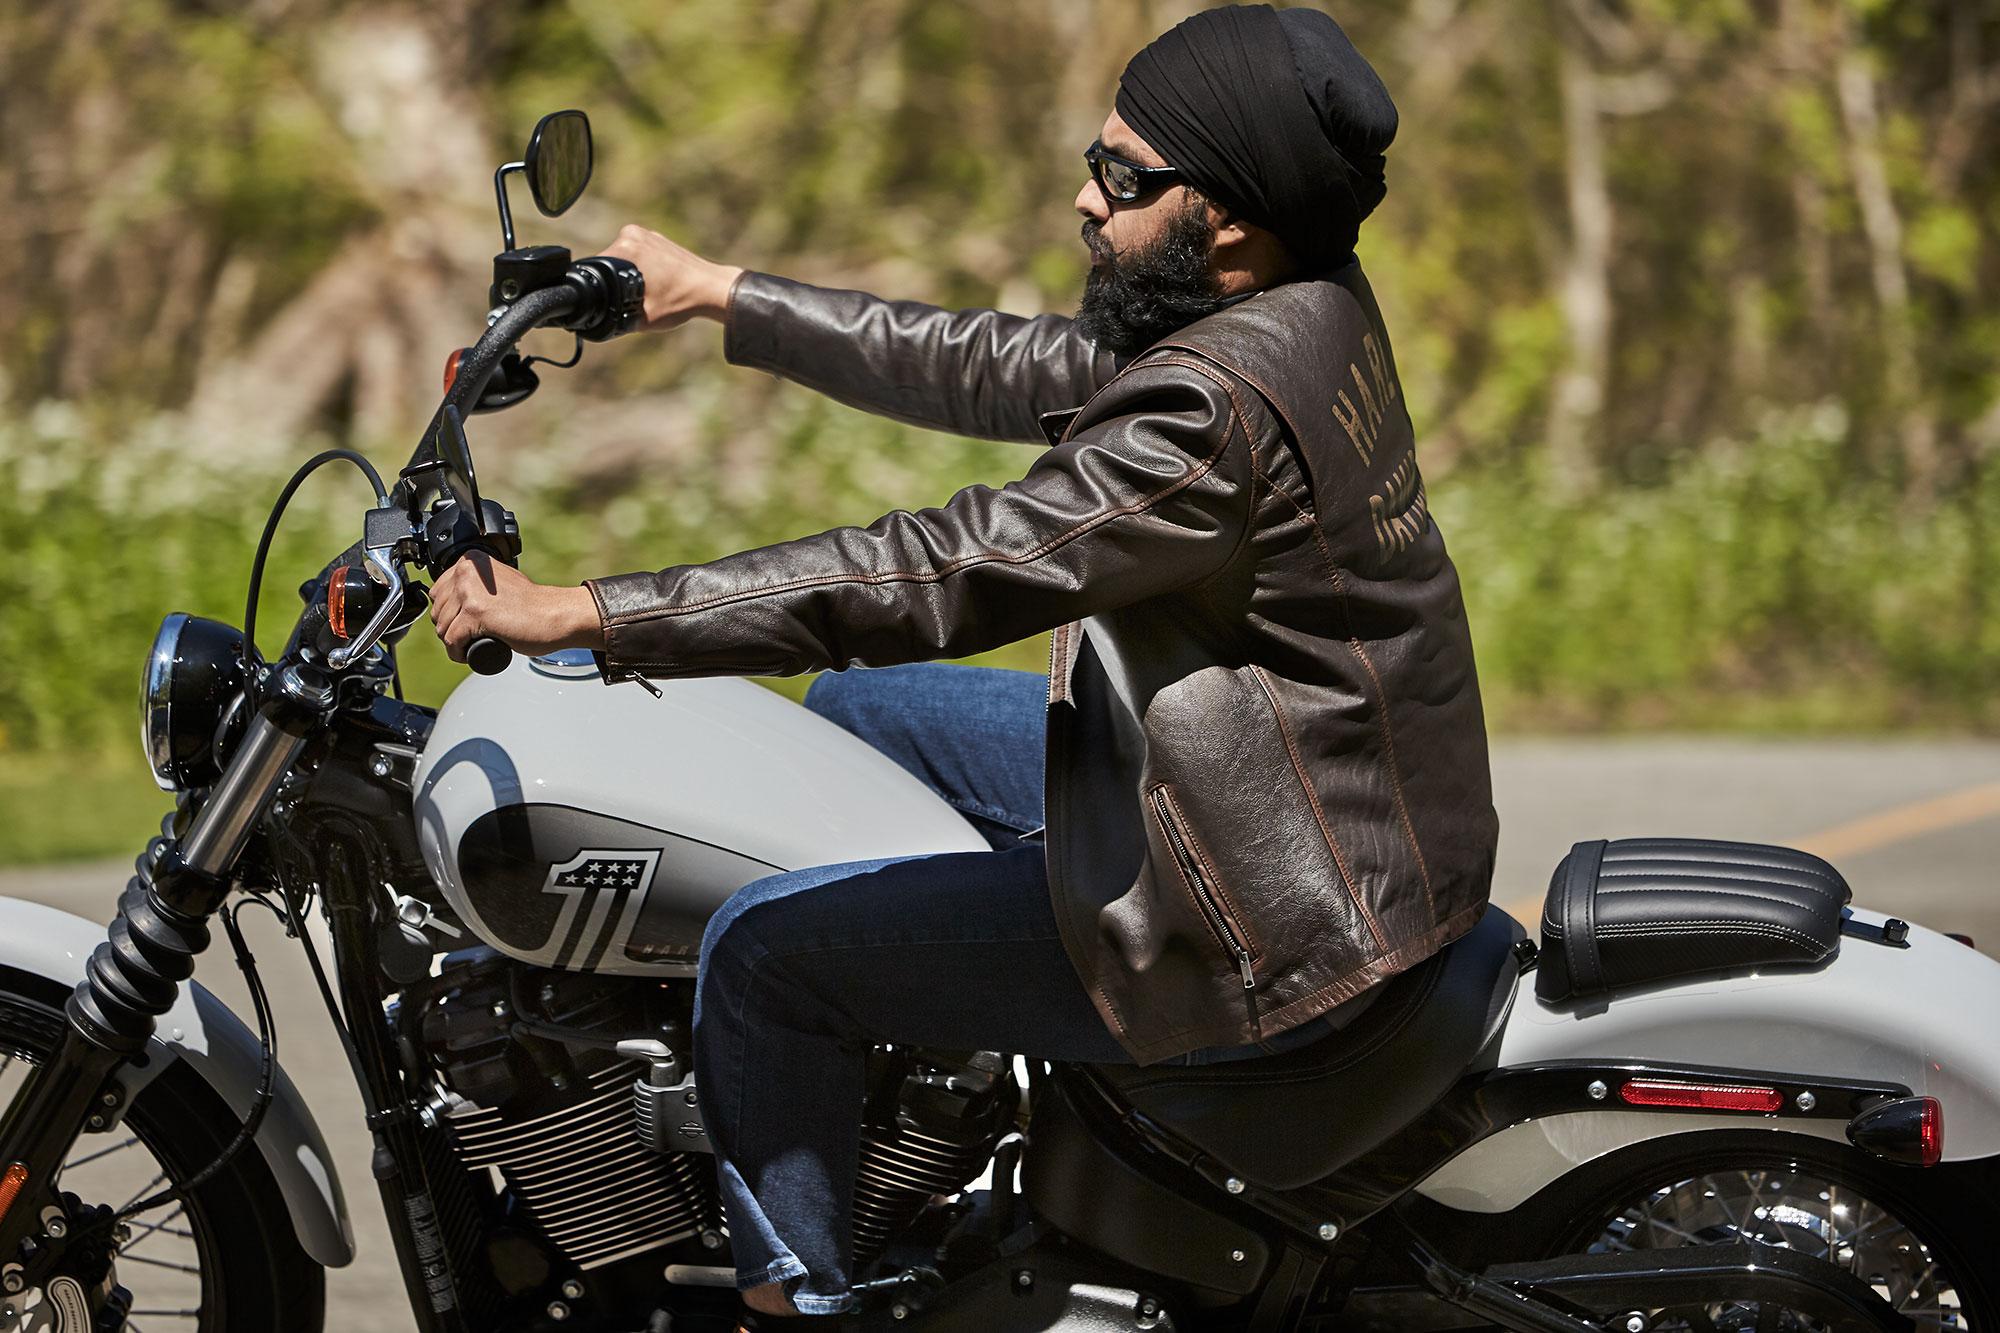 Tough Turban Sikh motorcycle helmet